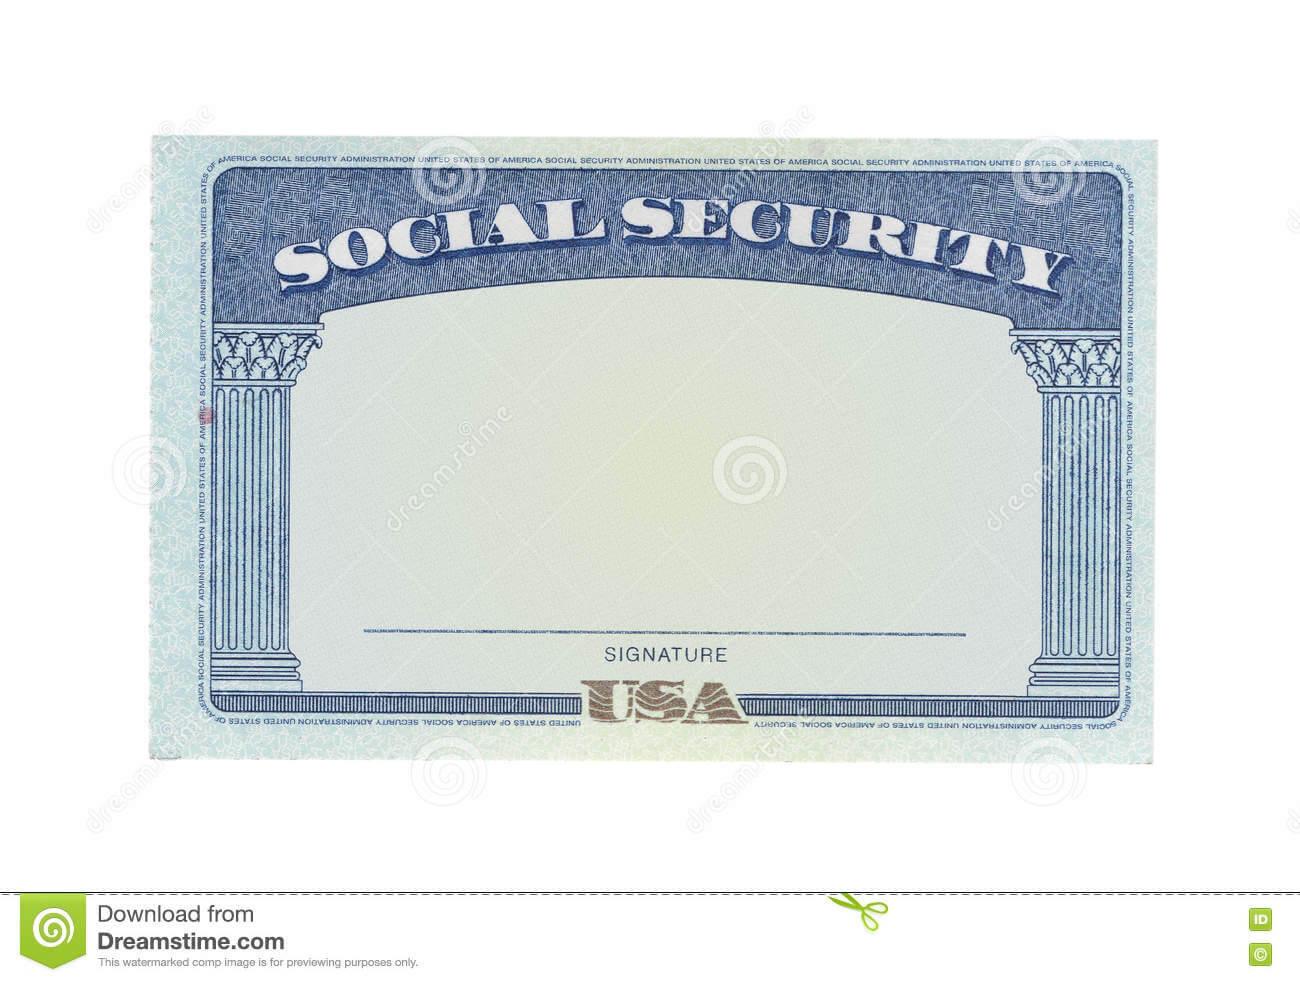 Blank Social Security Card Stock Photos - Download 117 pertaining to Blank Social Security Card Template Download